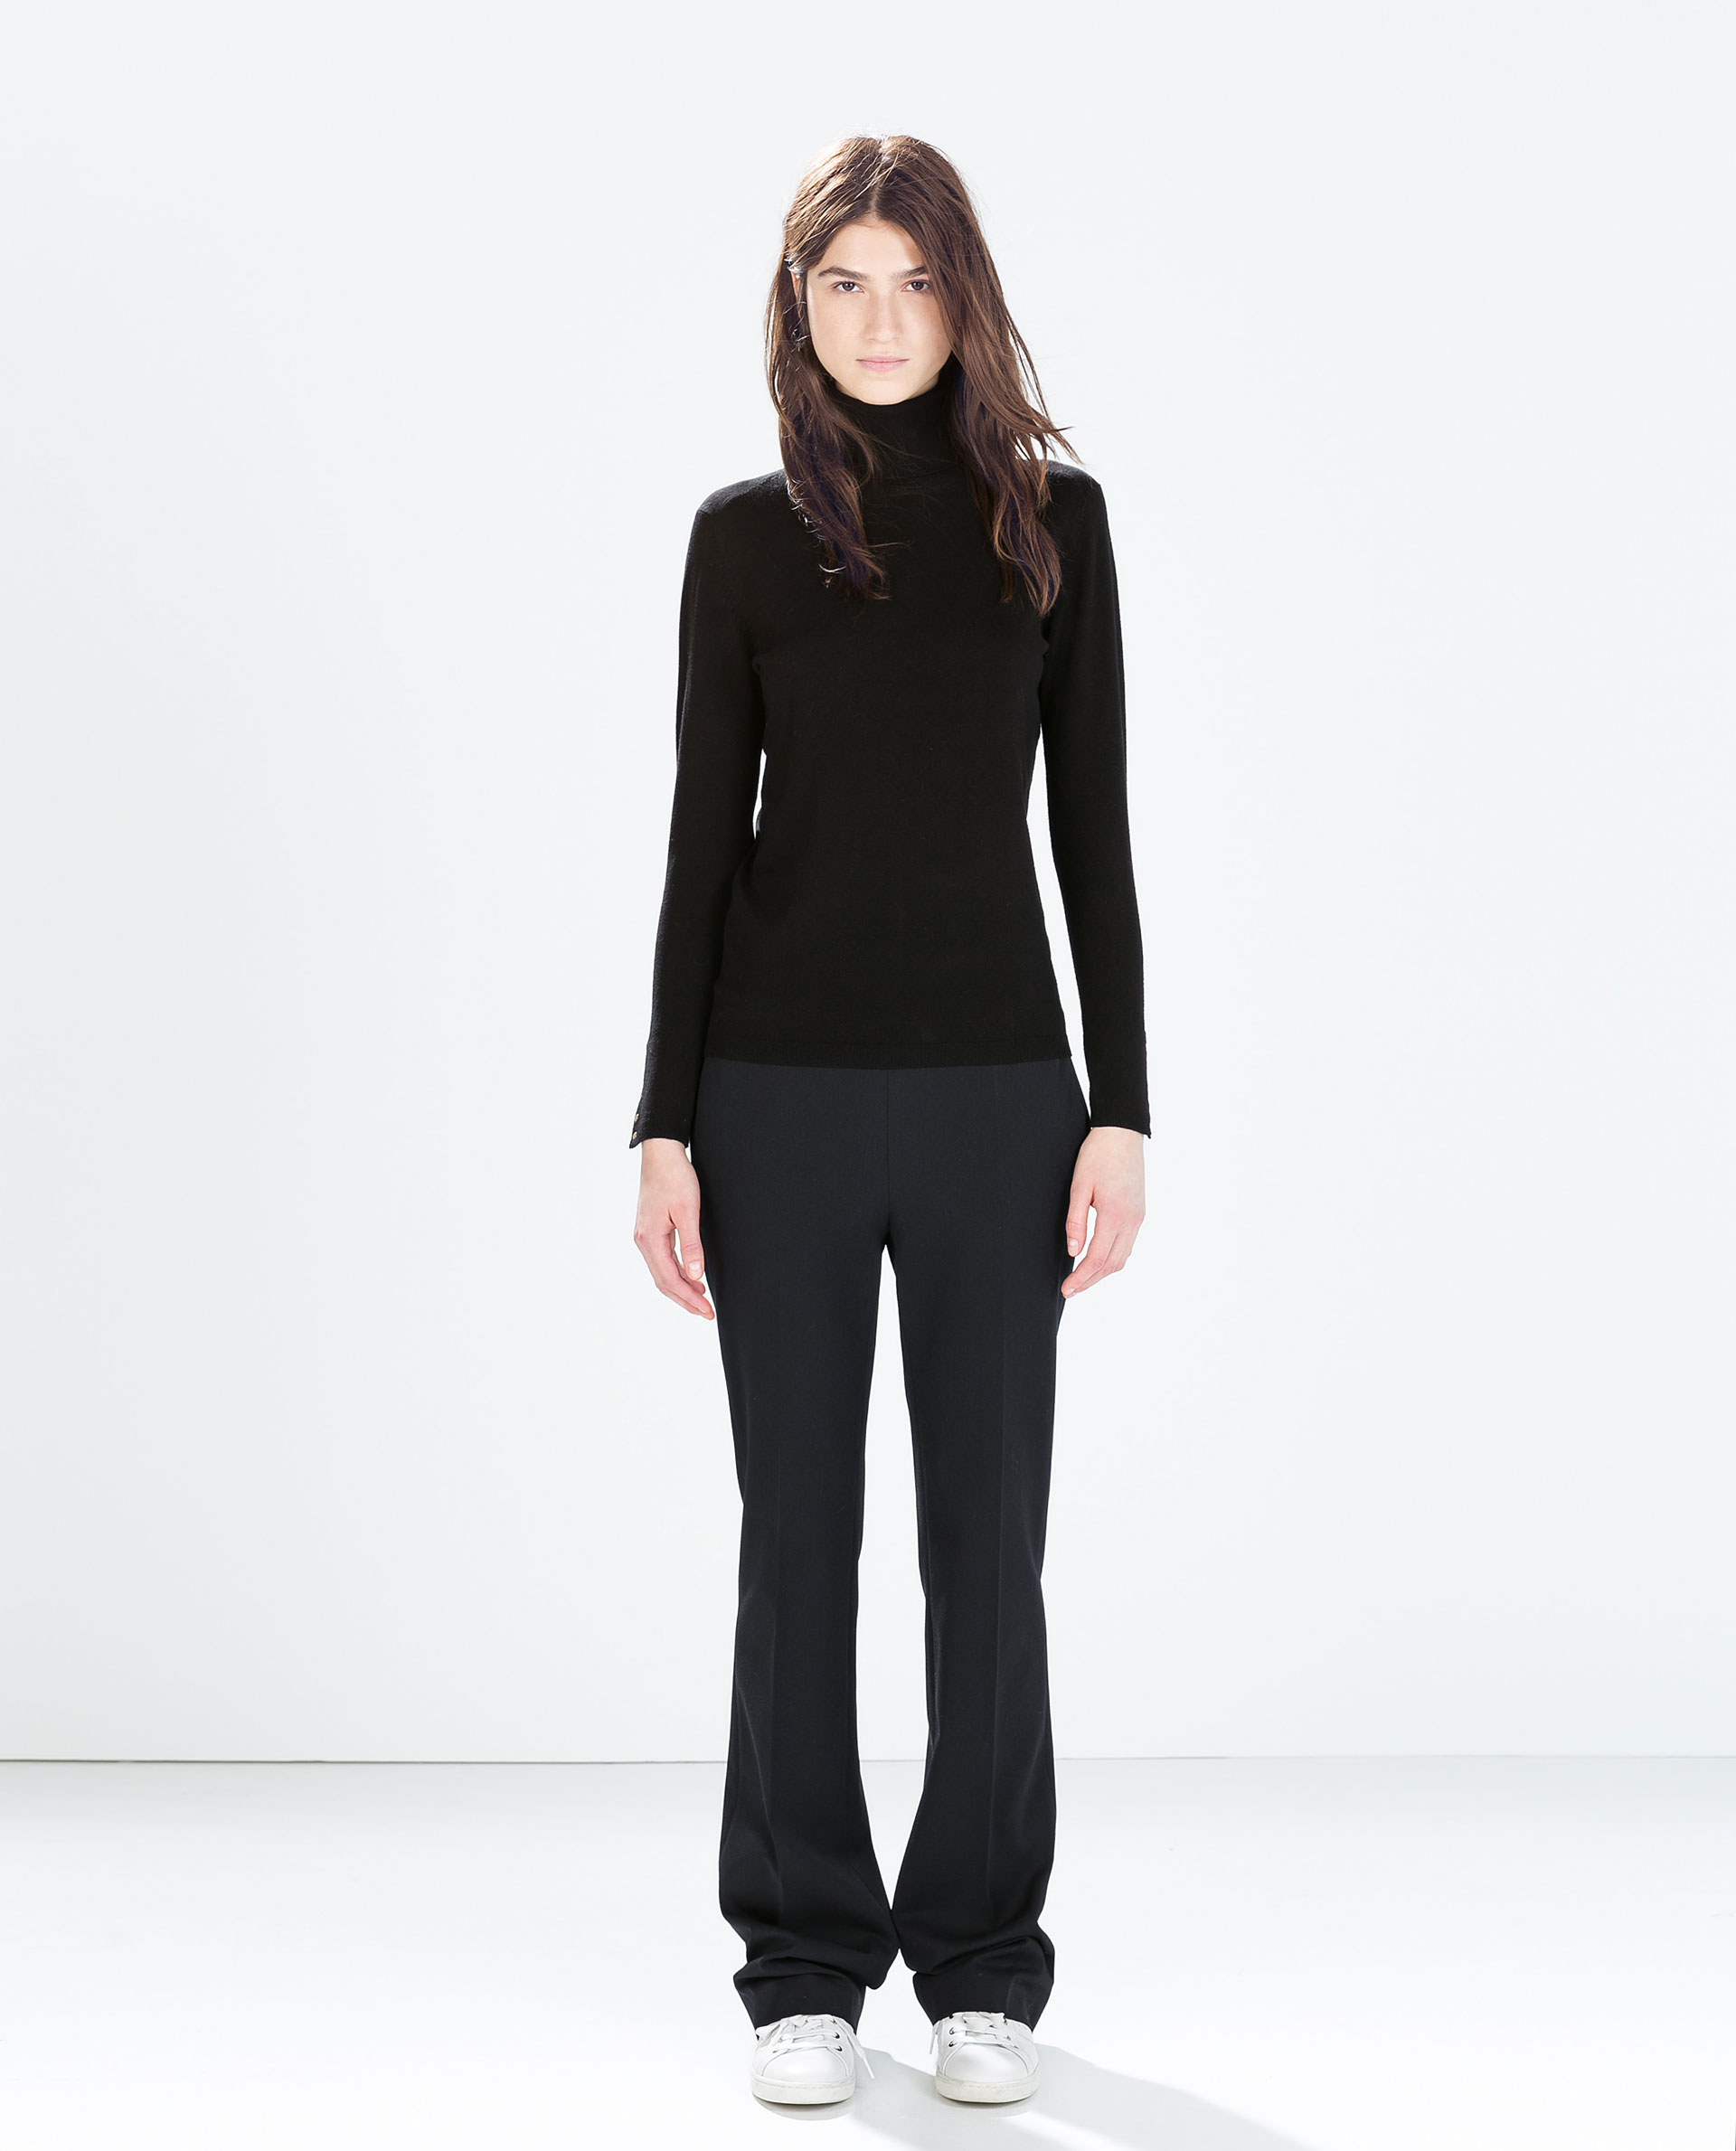 Zara Turtleneck Sweater Mens 14